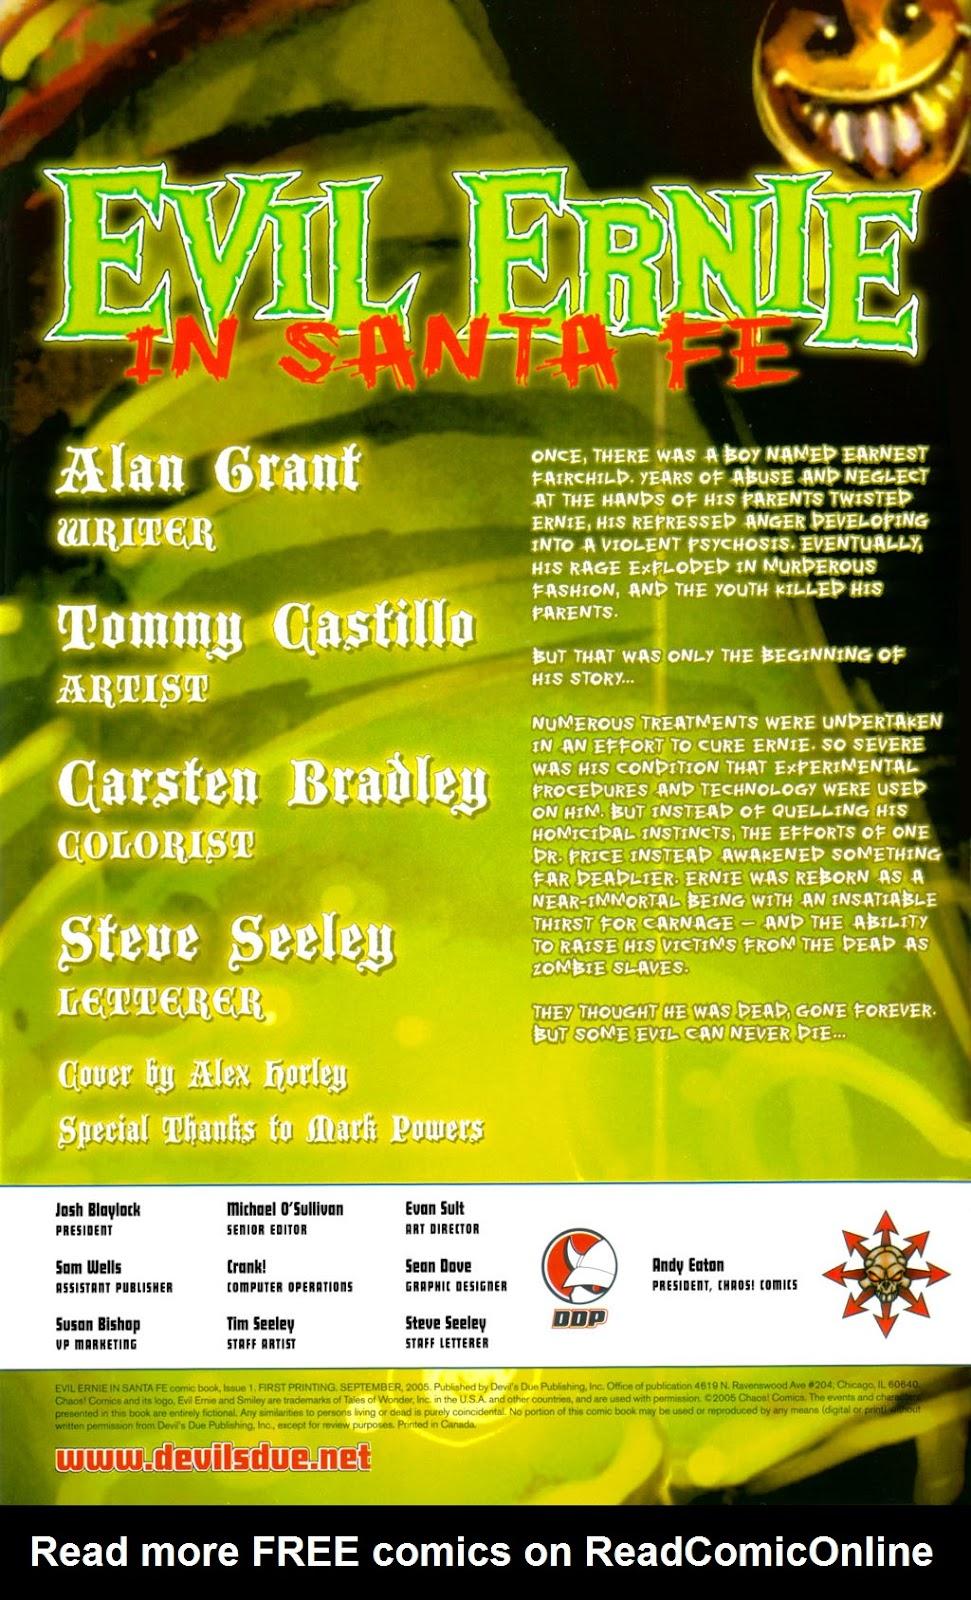 Read online Evil Ernie in Santa Fe comic -  Issue #1 - 2